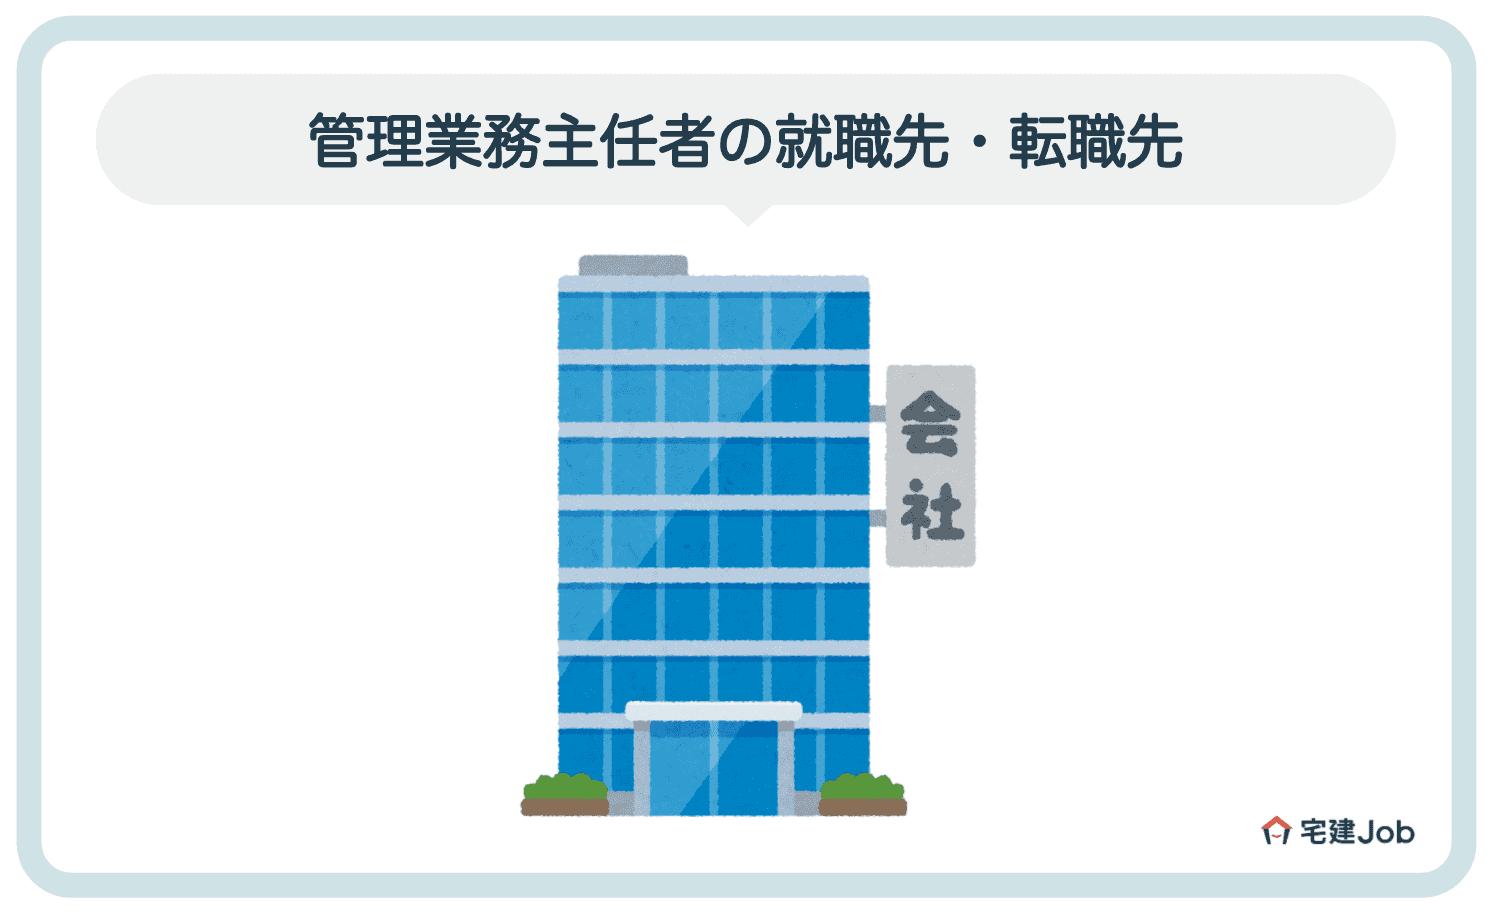 2.管理業務主任者の就職先【未経験の場合】